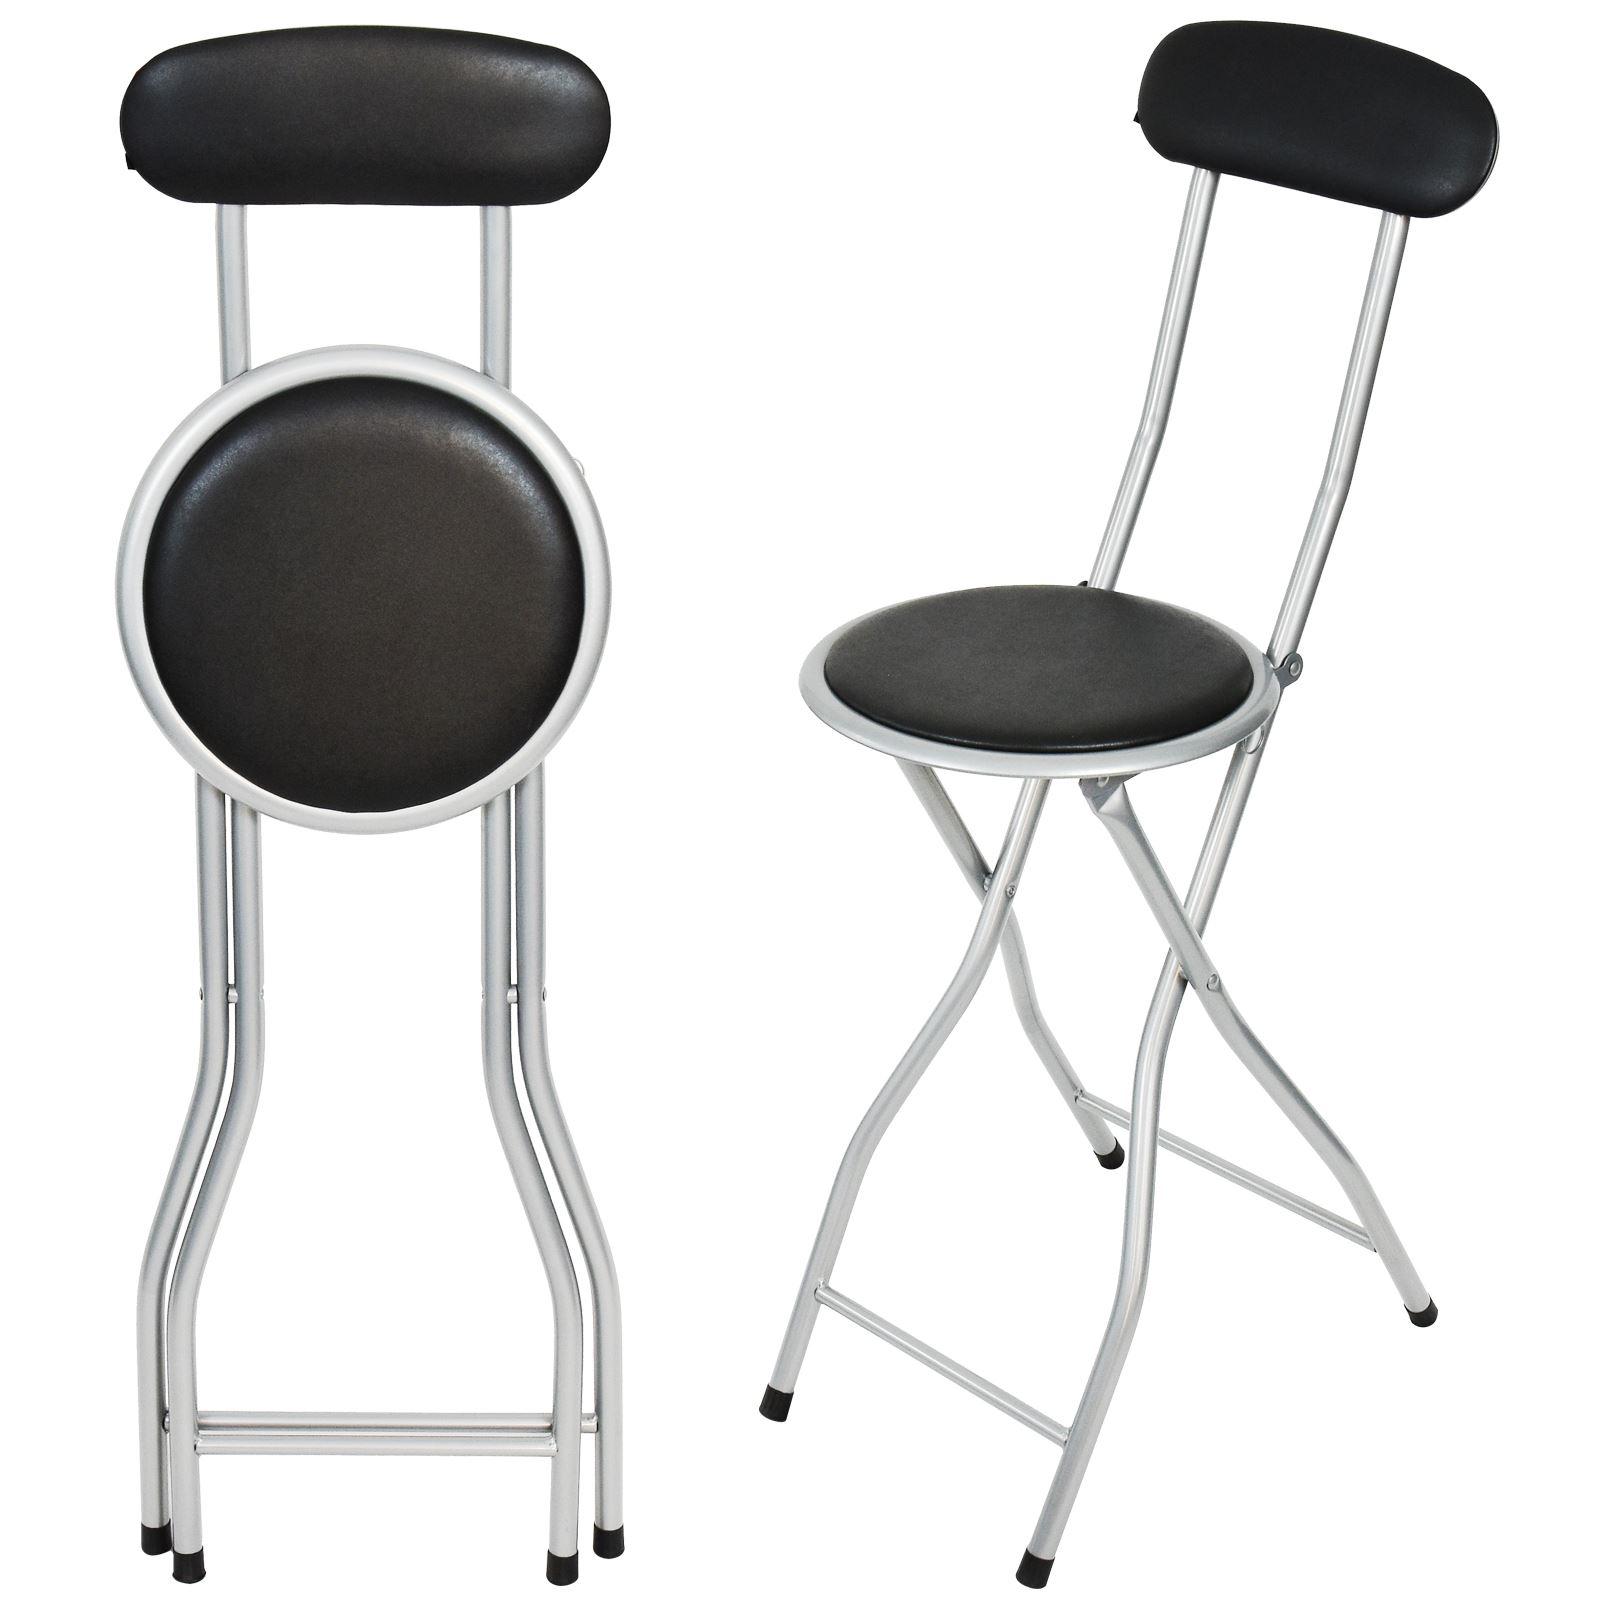 Desayuno port til plegable camping silla asiento taburete de bar fiesta de jard n al aire libre - Taburete bar plegable ...